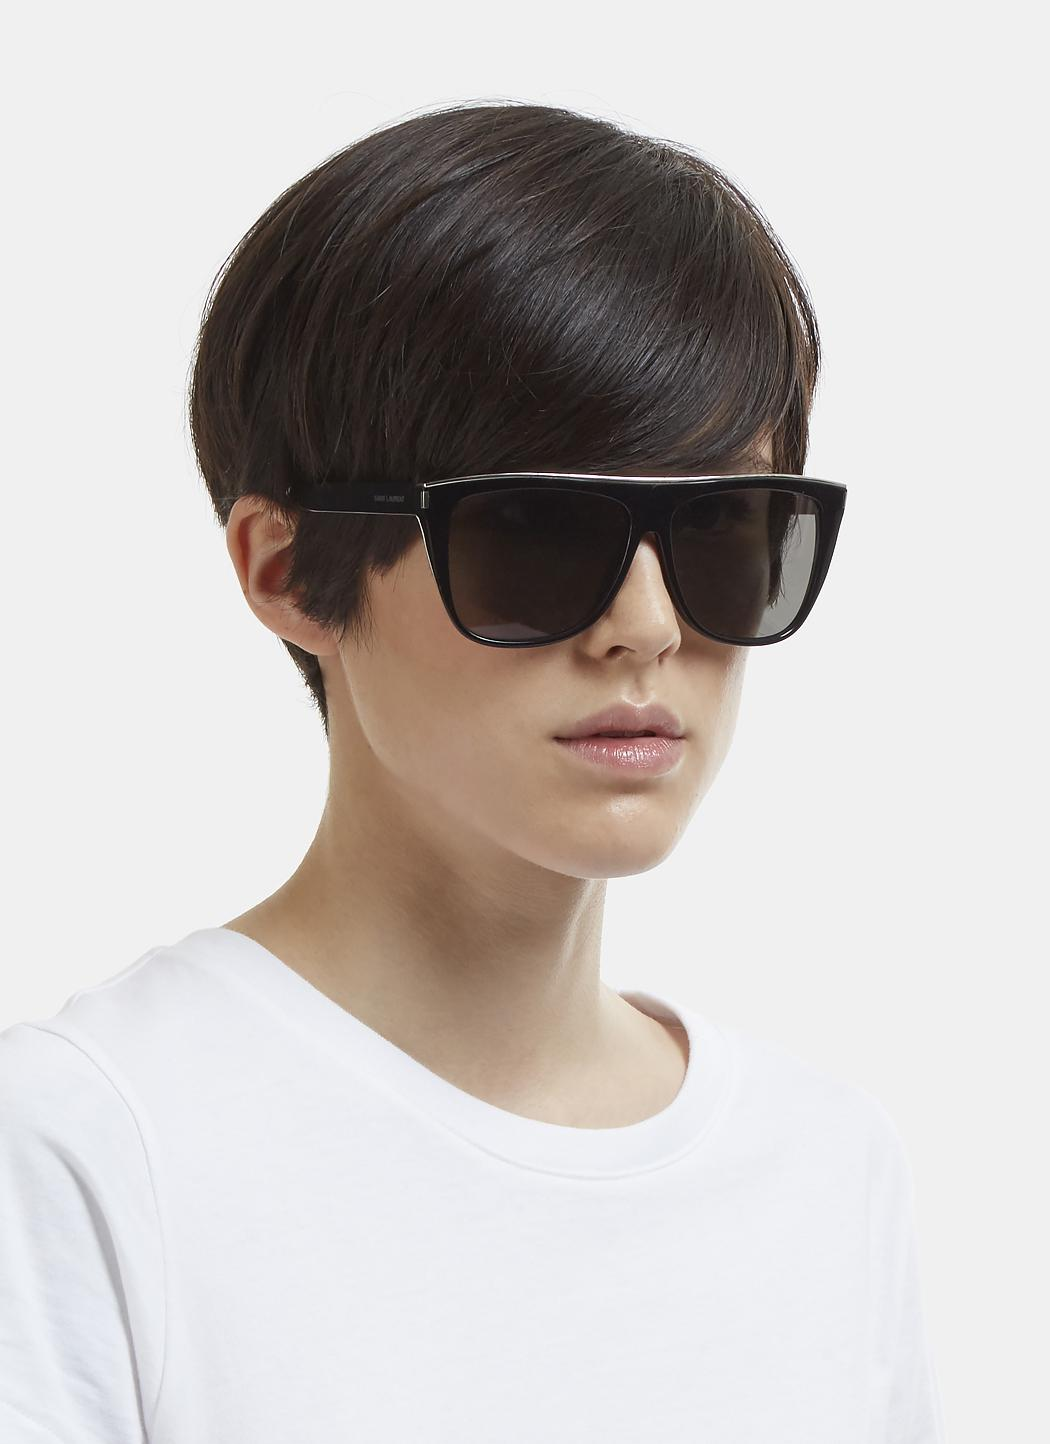 1a2c5caa771 Saint Laurent New Wave Sl 1 Sunglasses In Black in Black - Lyst